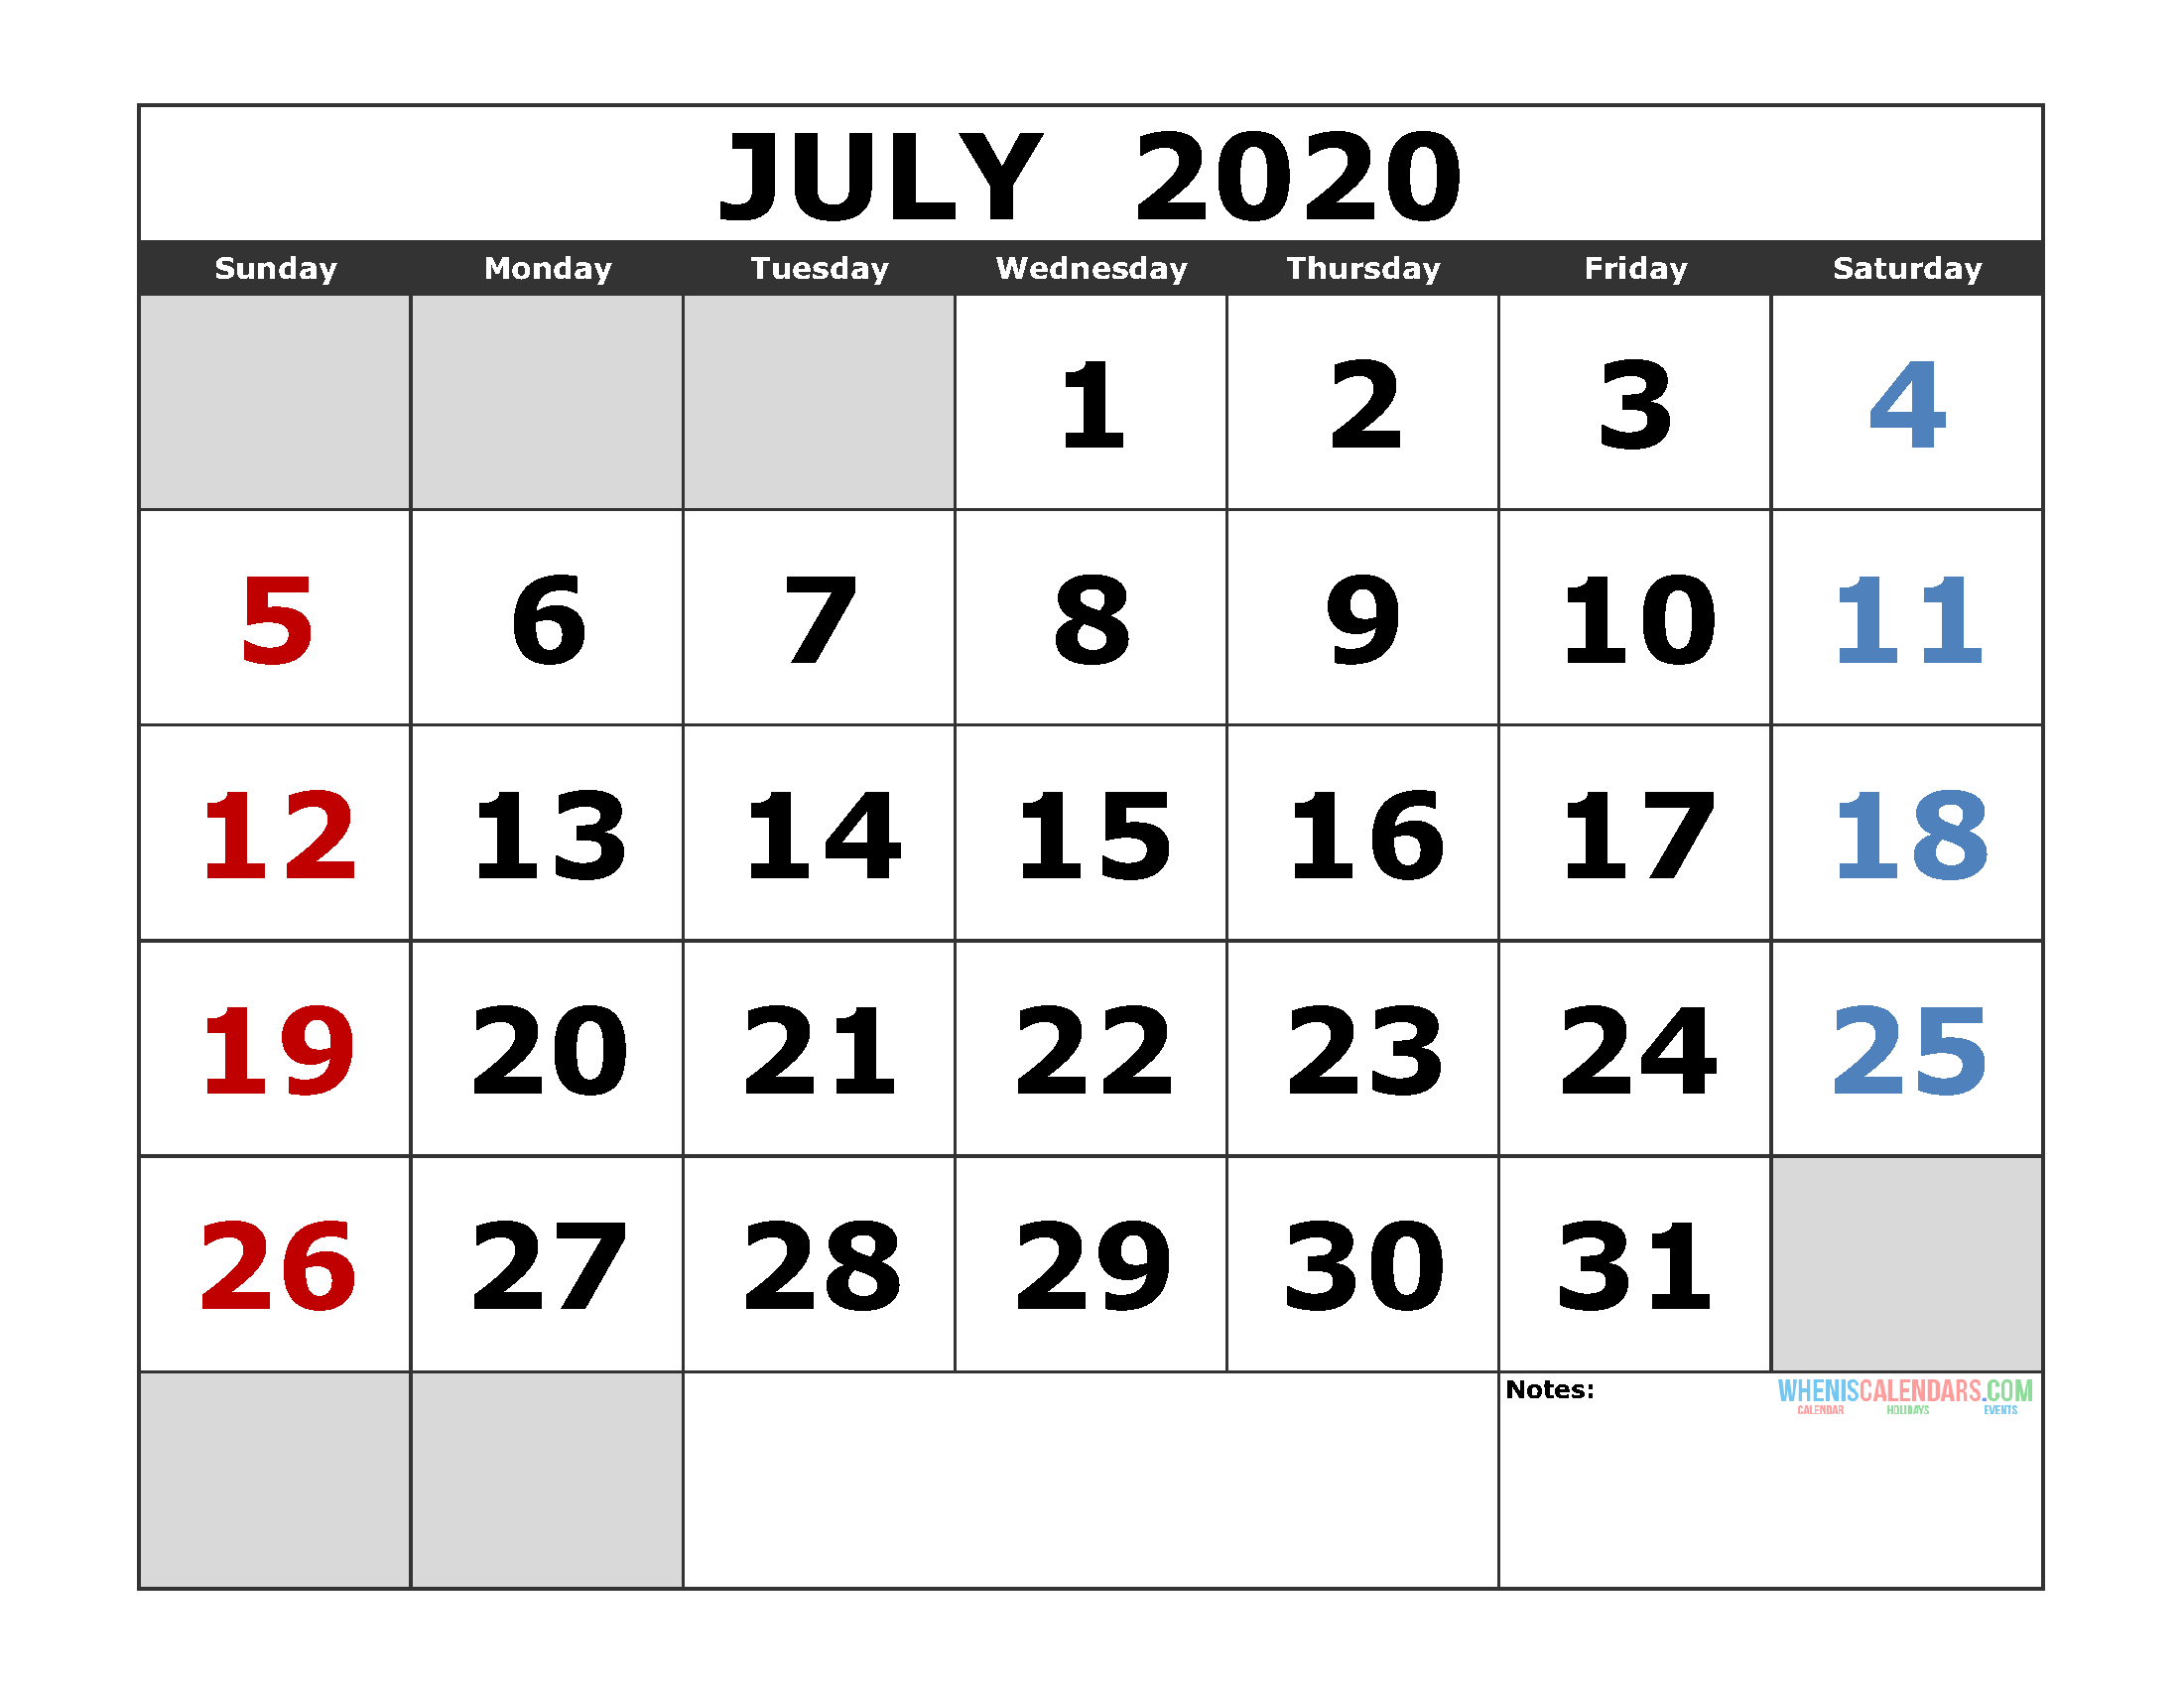 July Calendar 2020.July 2020 Printable Calendar Template Excel Pdf Image Us Edition